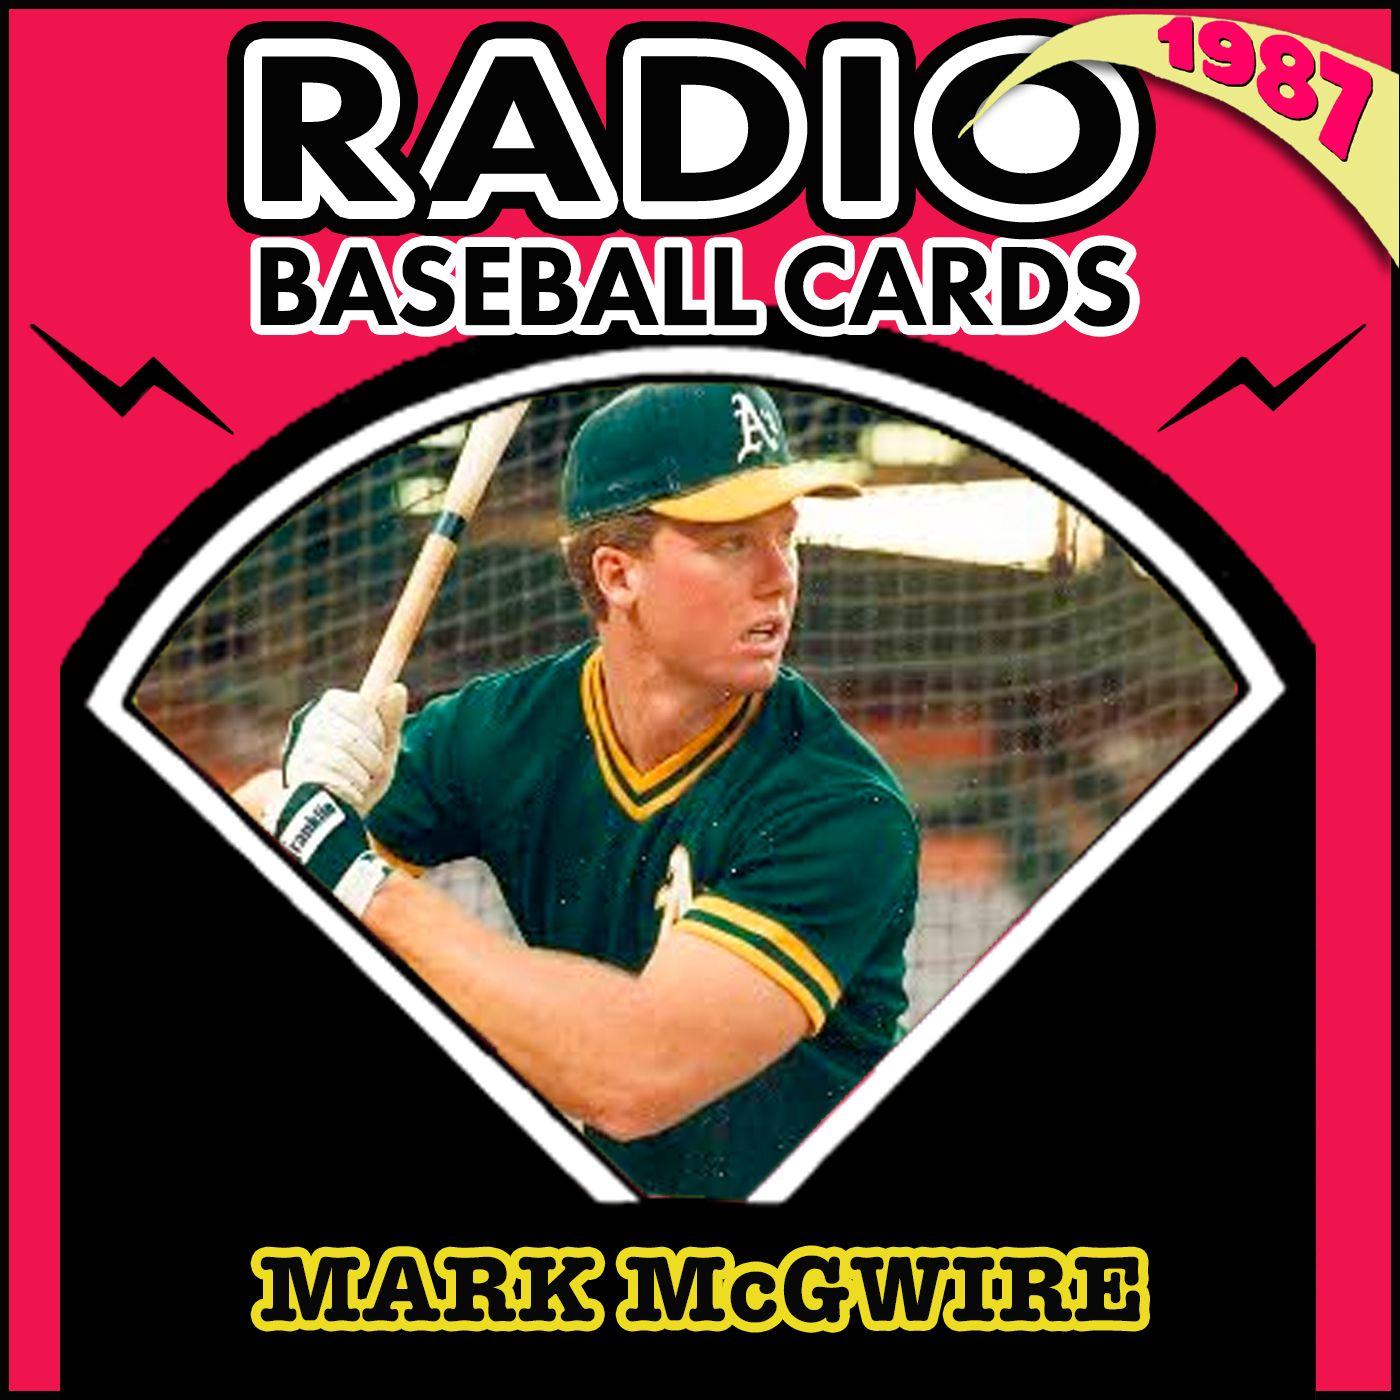 Rookie Mark McGwire on Keeping the Game Fun